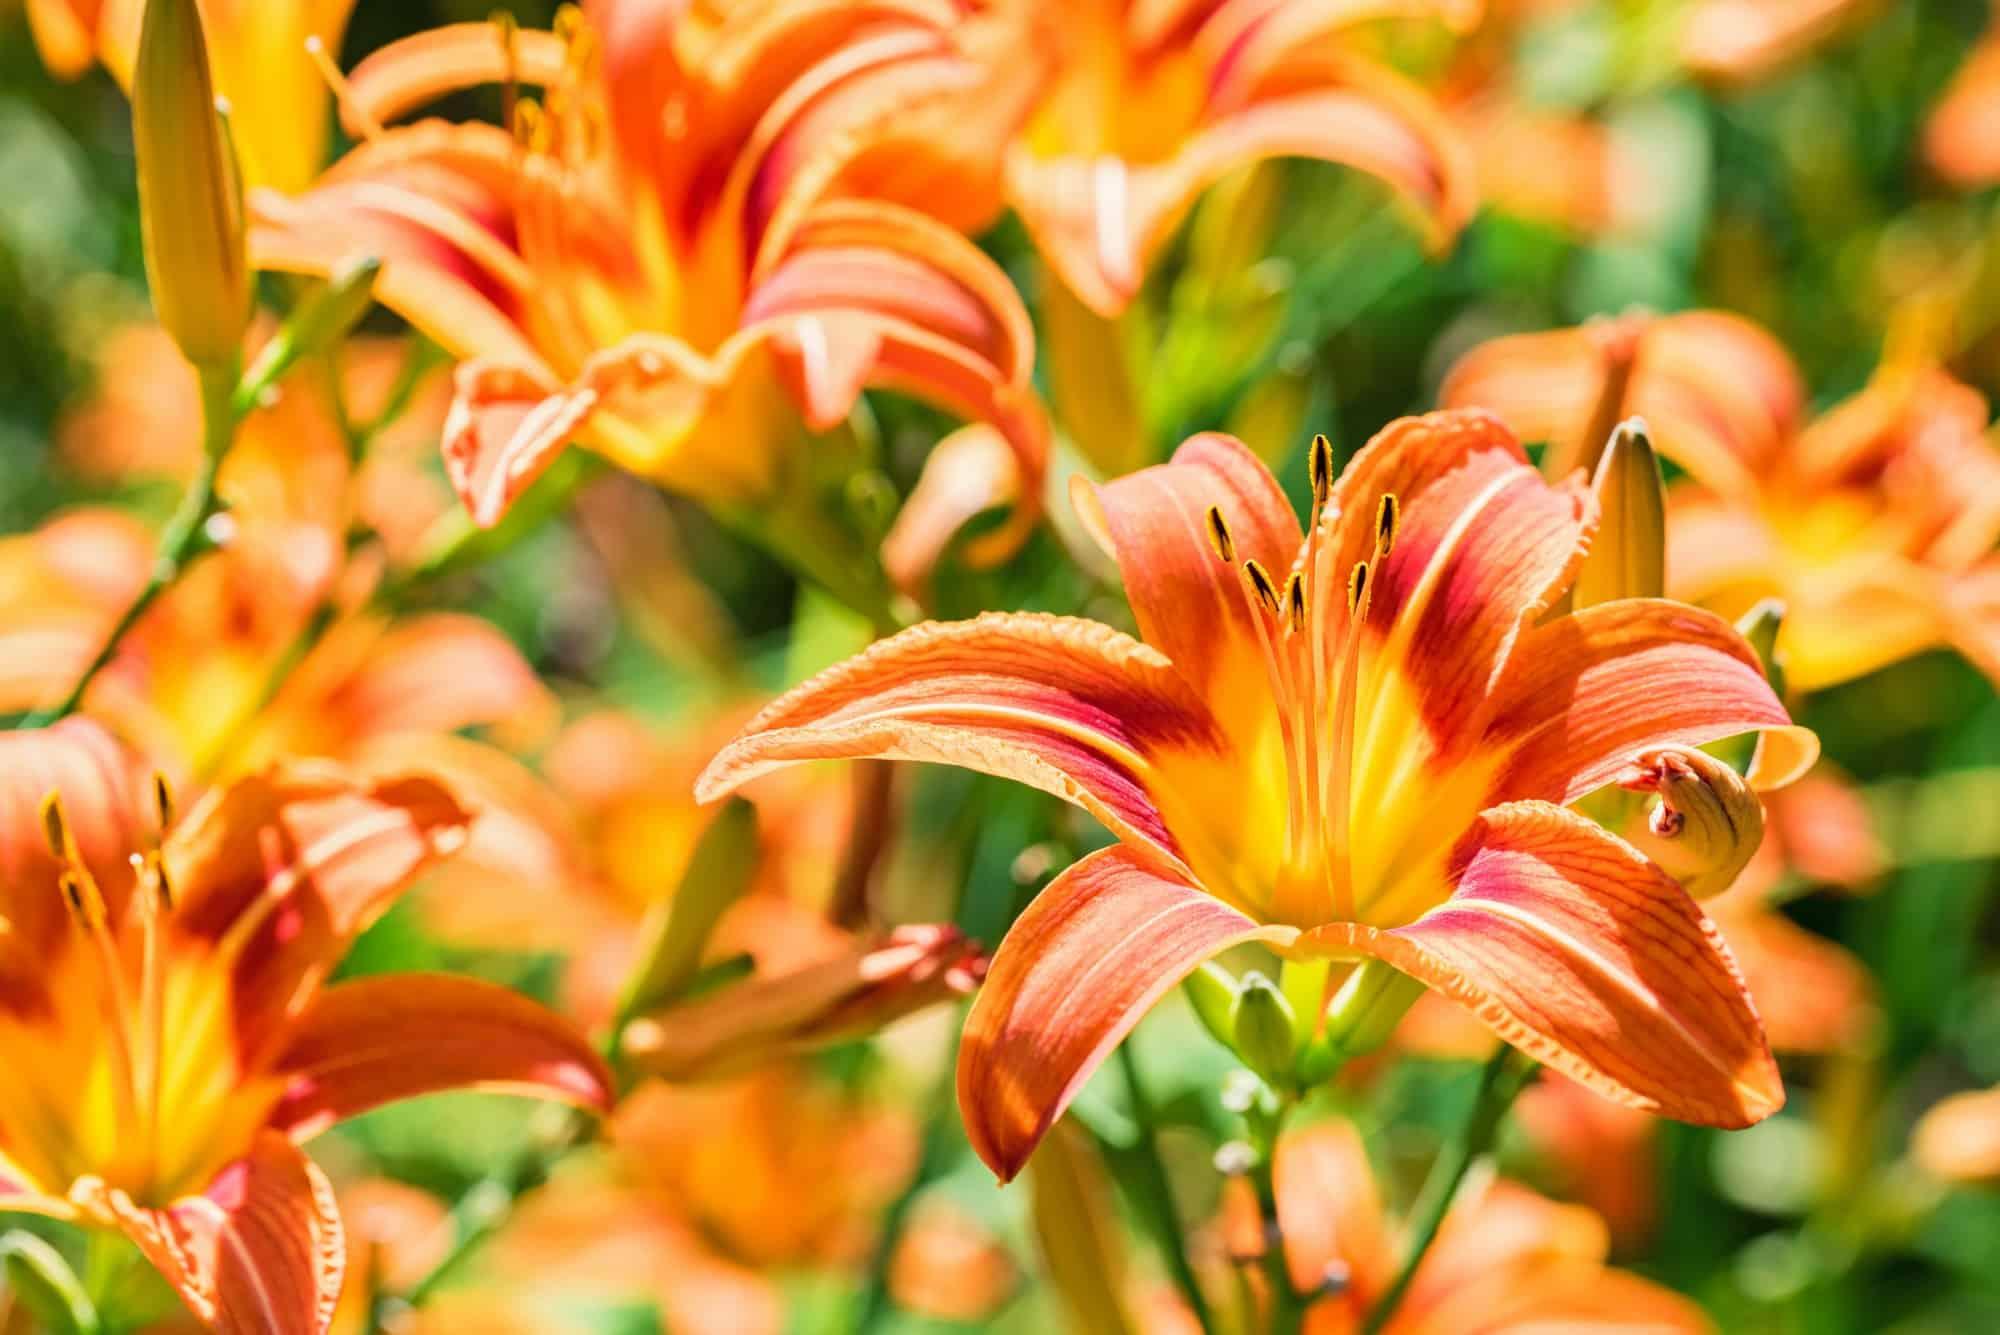 Several Hemerocallis fulva or orange Daylily blooming in garden